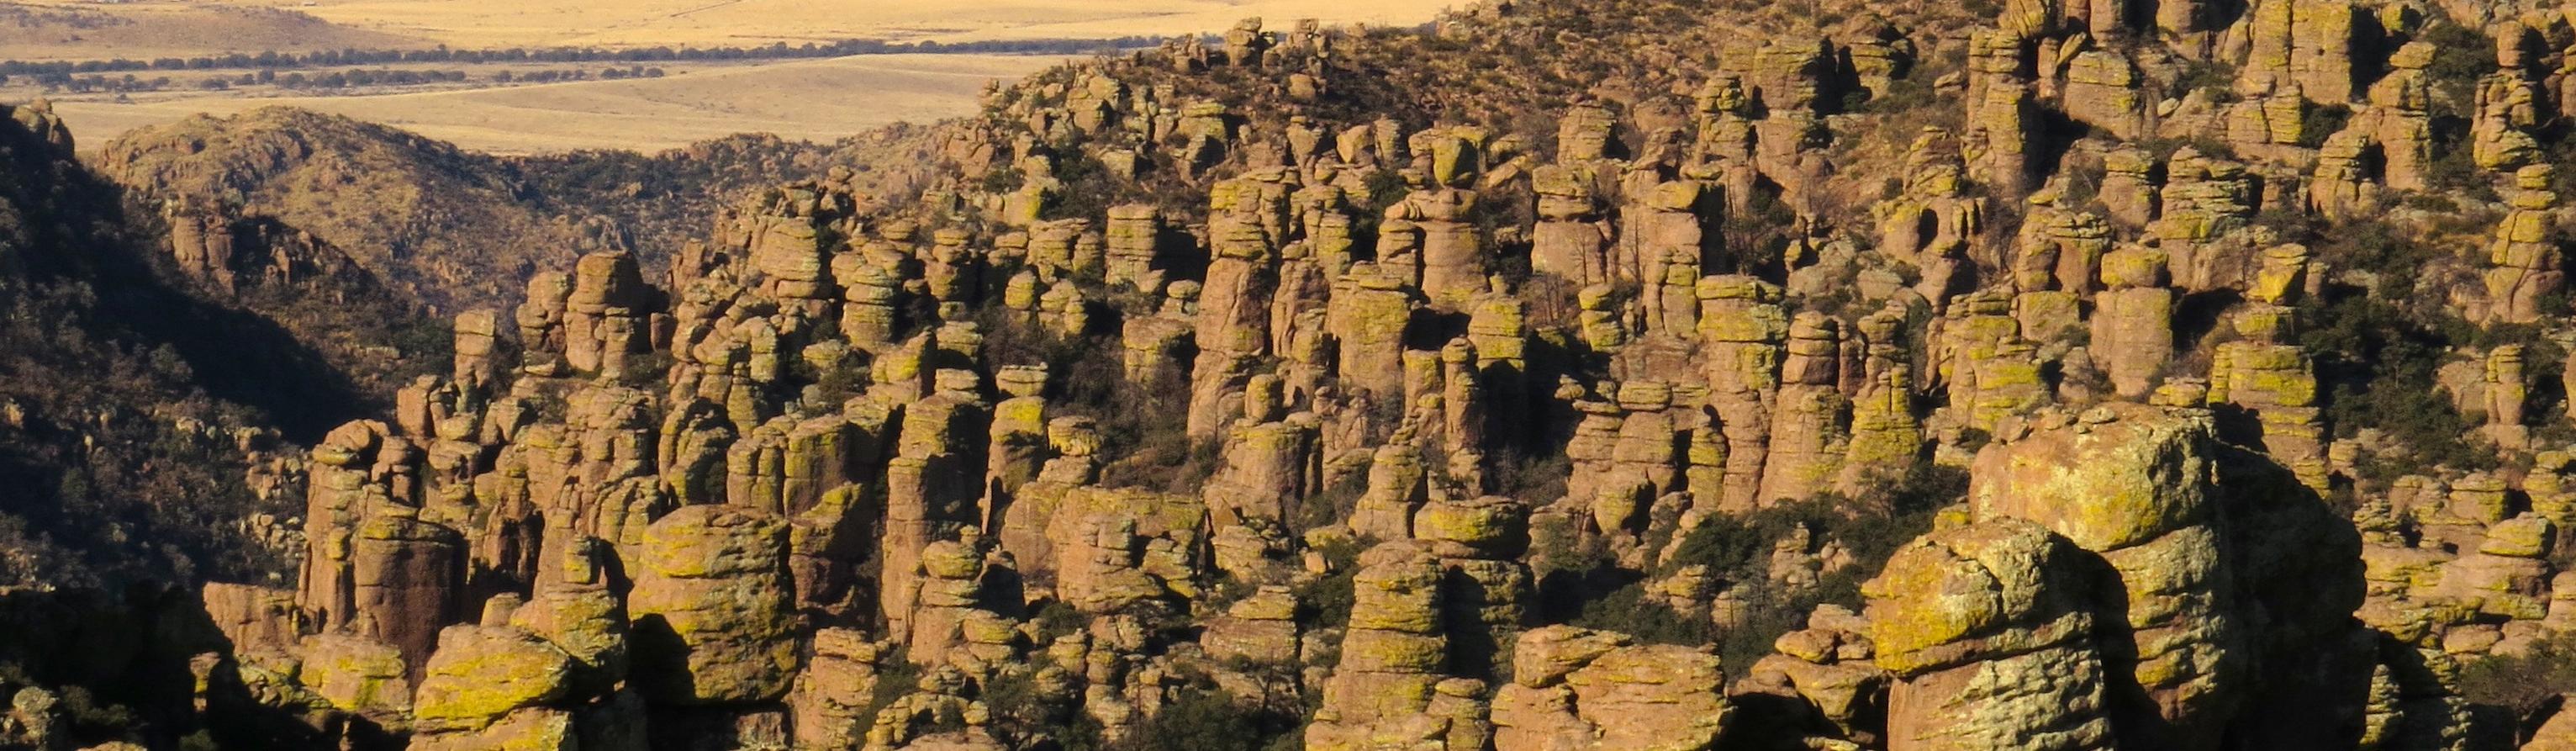 Chiricahua National Monument (U.S. National Park Service)